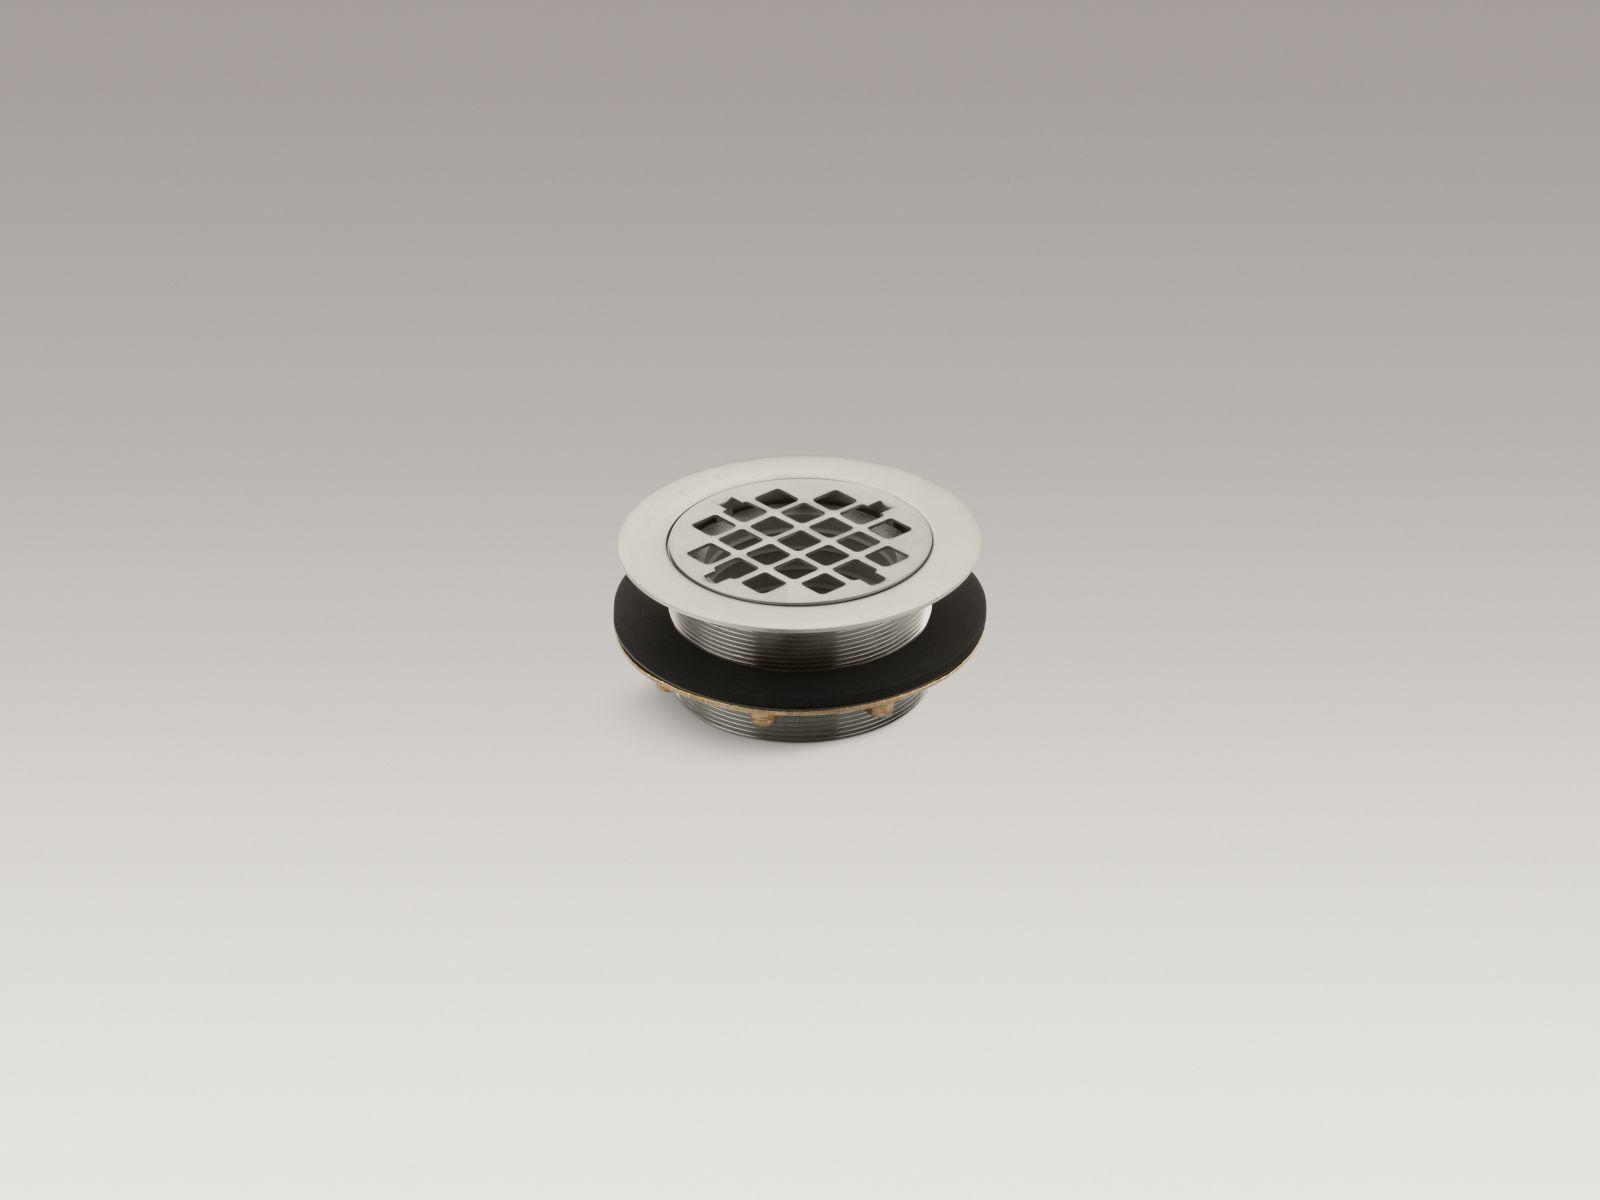 Kohler K-9132-BN Round Shower Base Drain with Plastic Pipe Gasket Vibrant Brushed Nickel